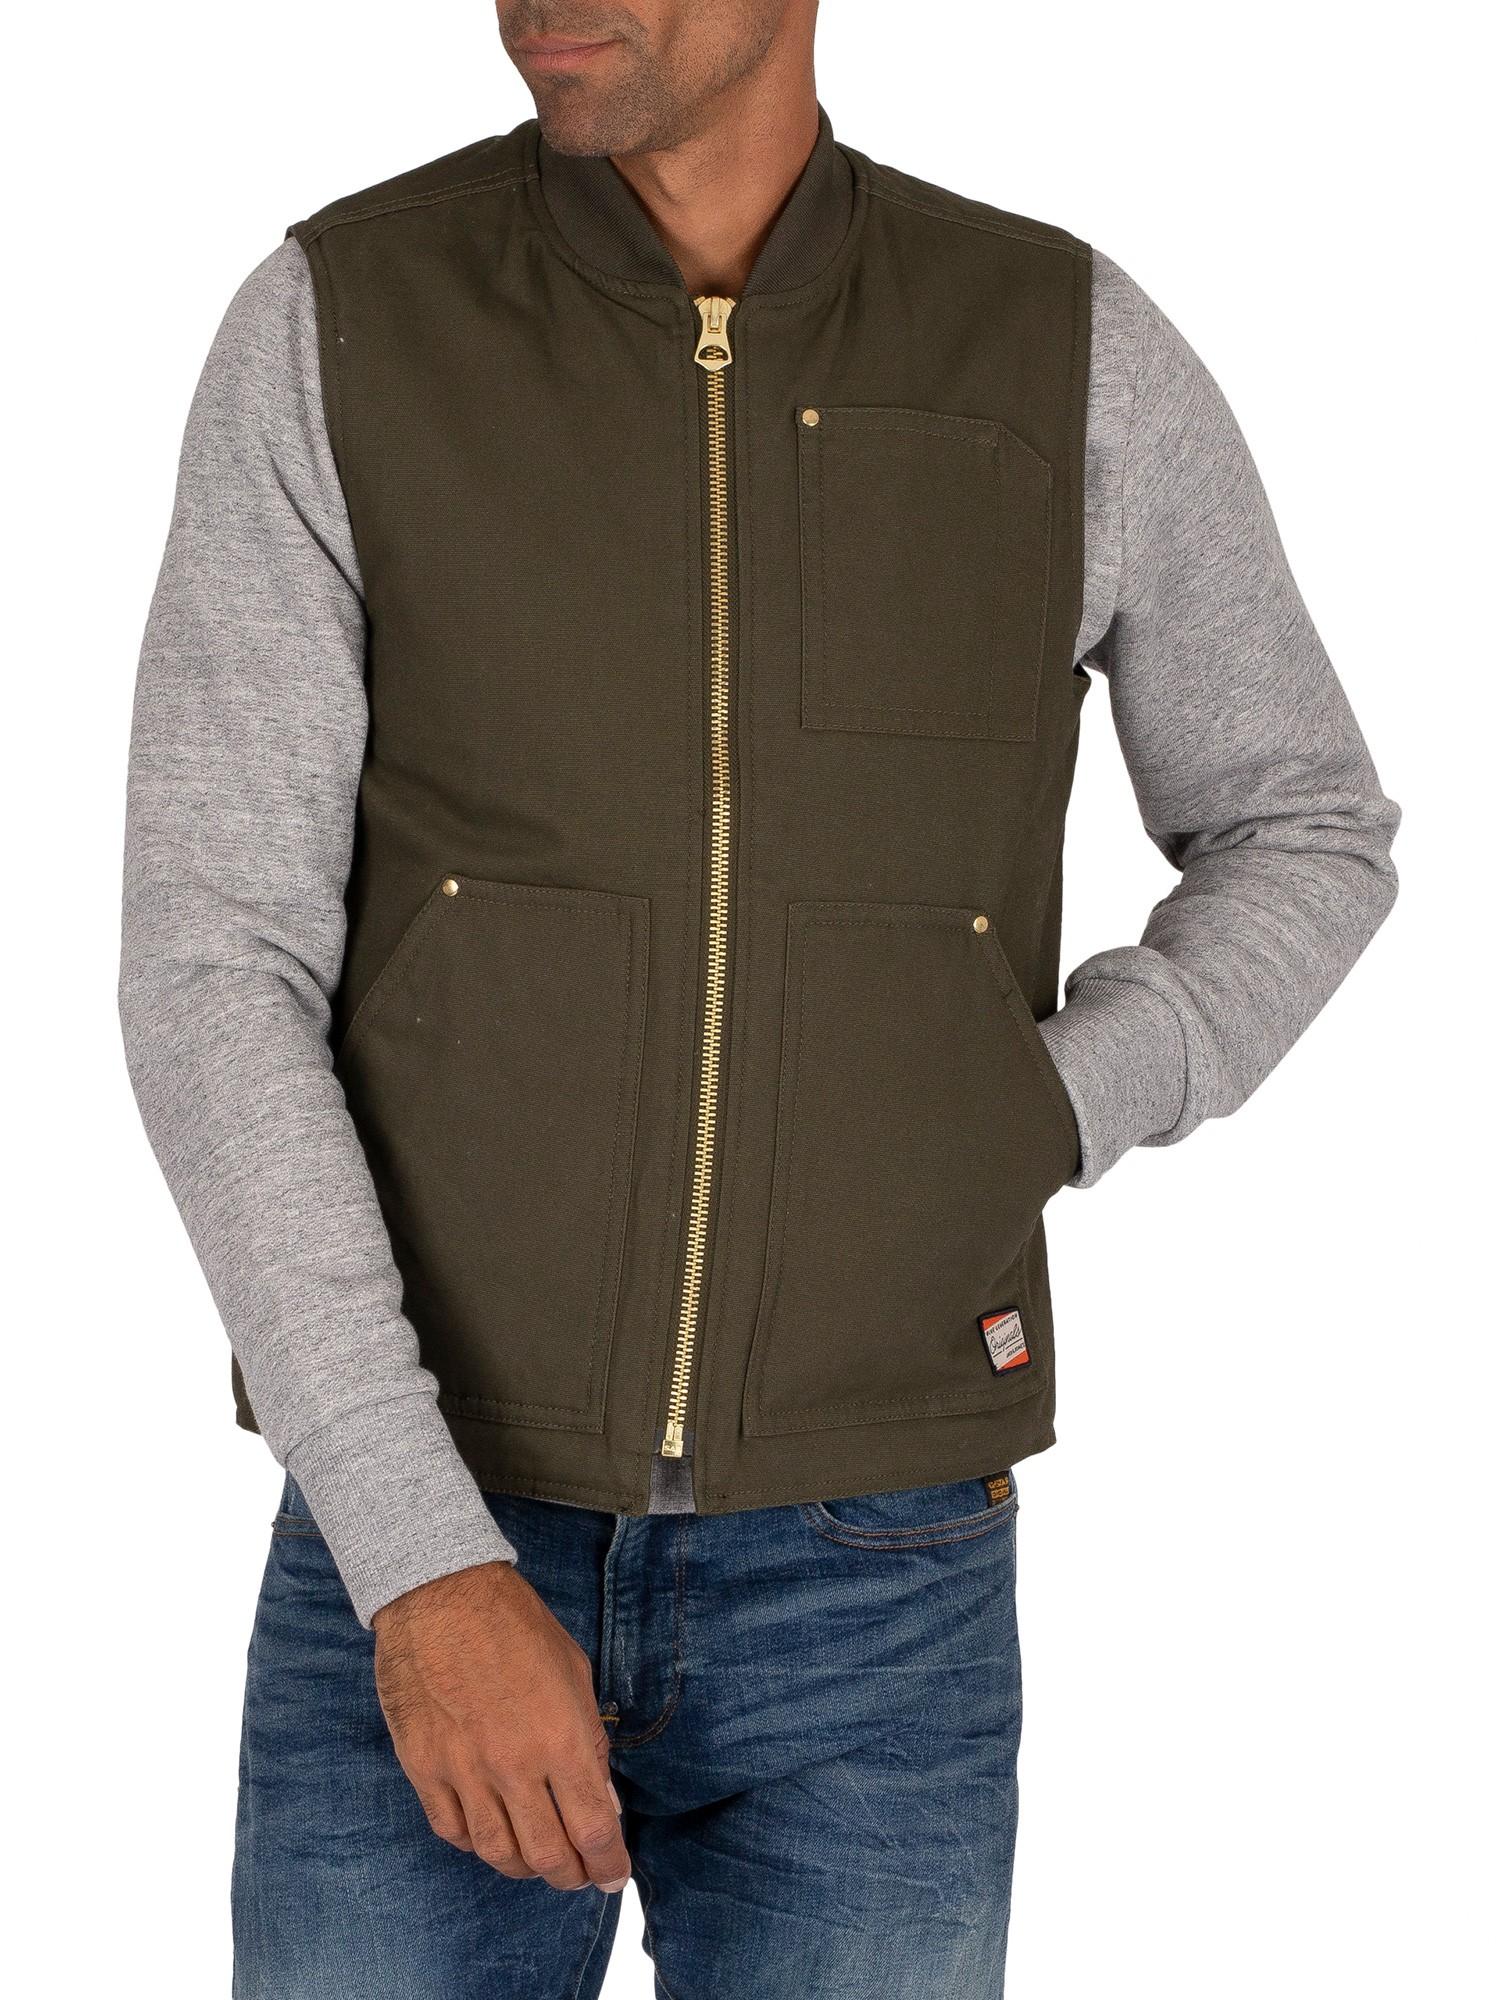 Wally-Bodywarmer-Jacket